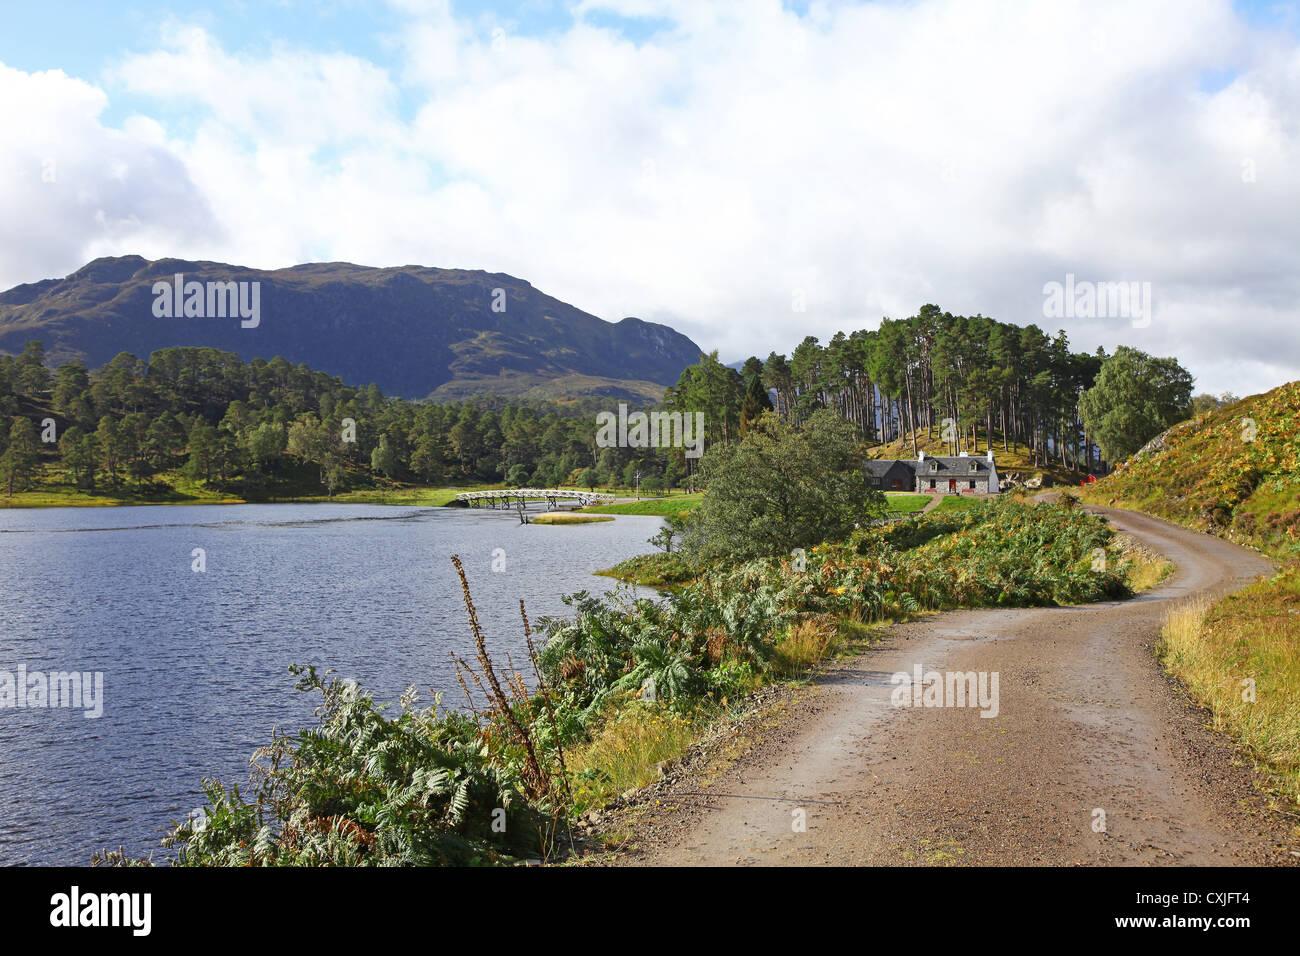 Looking towards Affric Lodge on Loch Affric Glen Affric Scottish Highlands Scotland UK - Stock Image